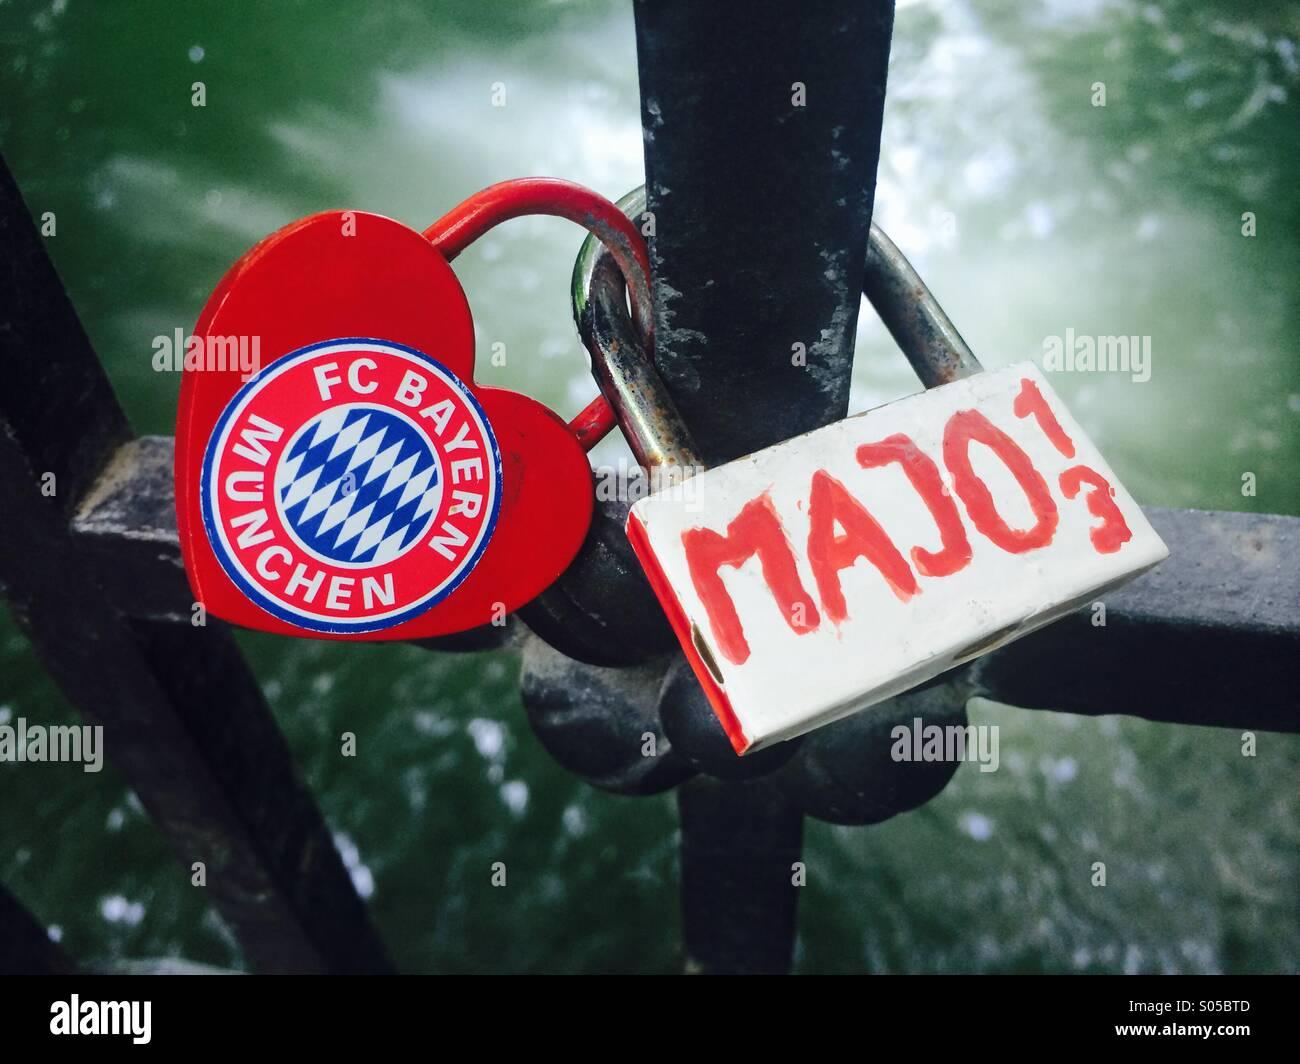 fc Bayern muenchen - Stock Image